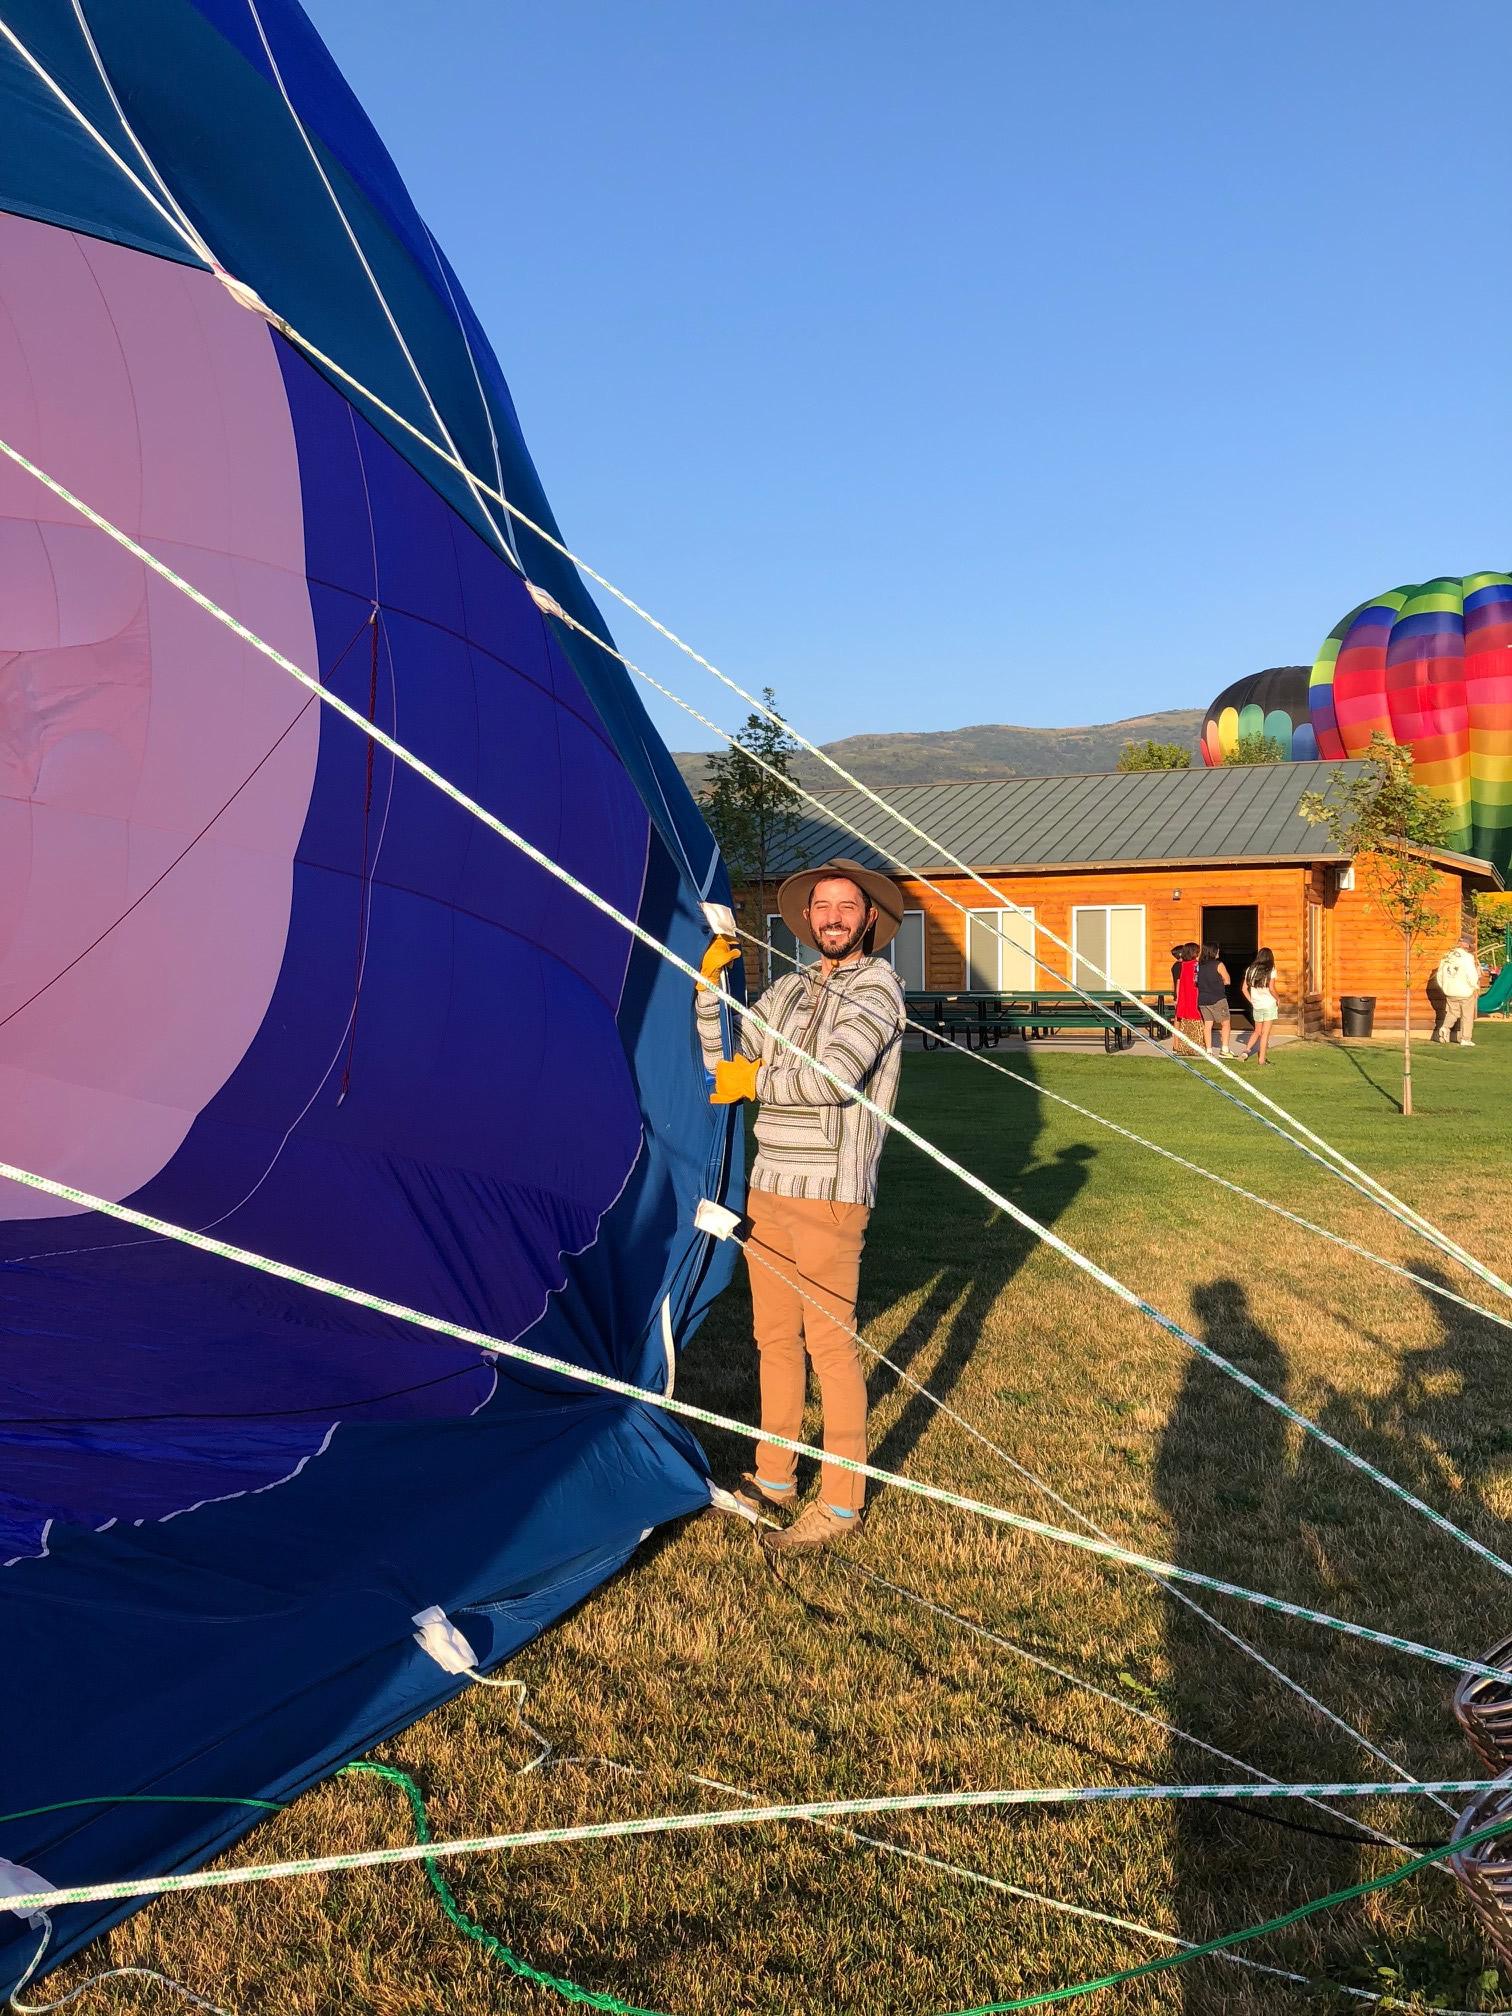 RE/MAX balloon